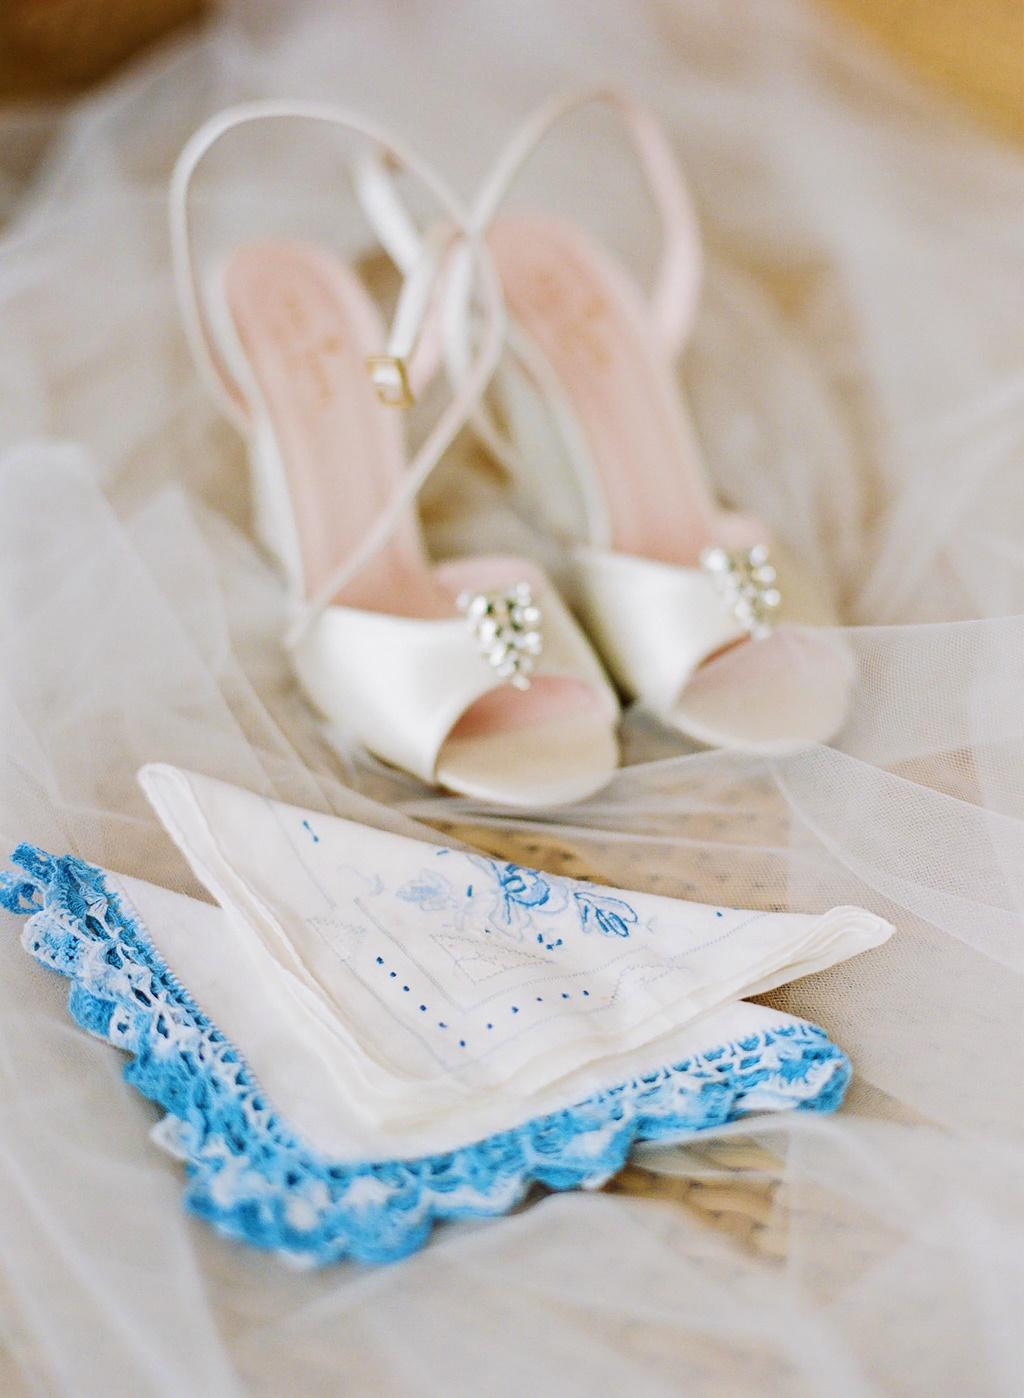 Style-Me-Pretty-TROPICAL-AND-GLAMOROUS-WEDDING-AT-ST.-THOMAS-RITZ-8